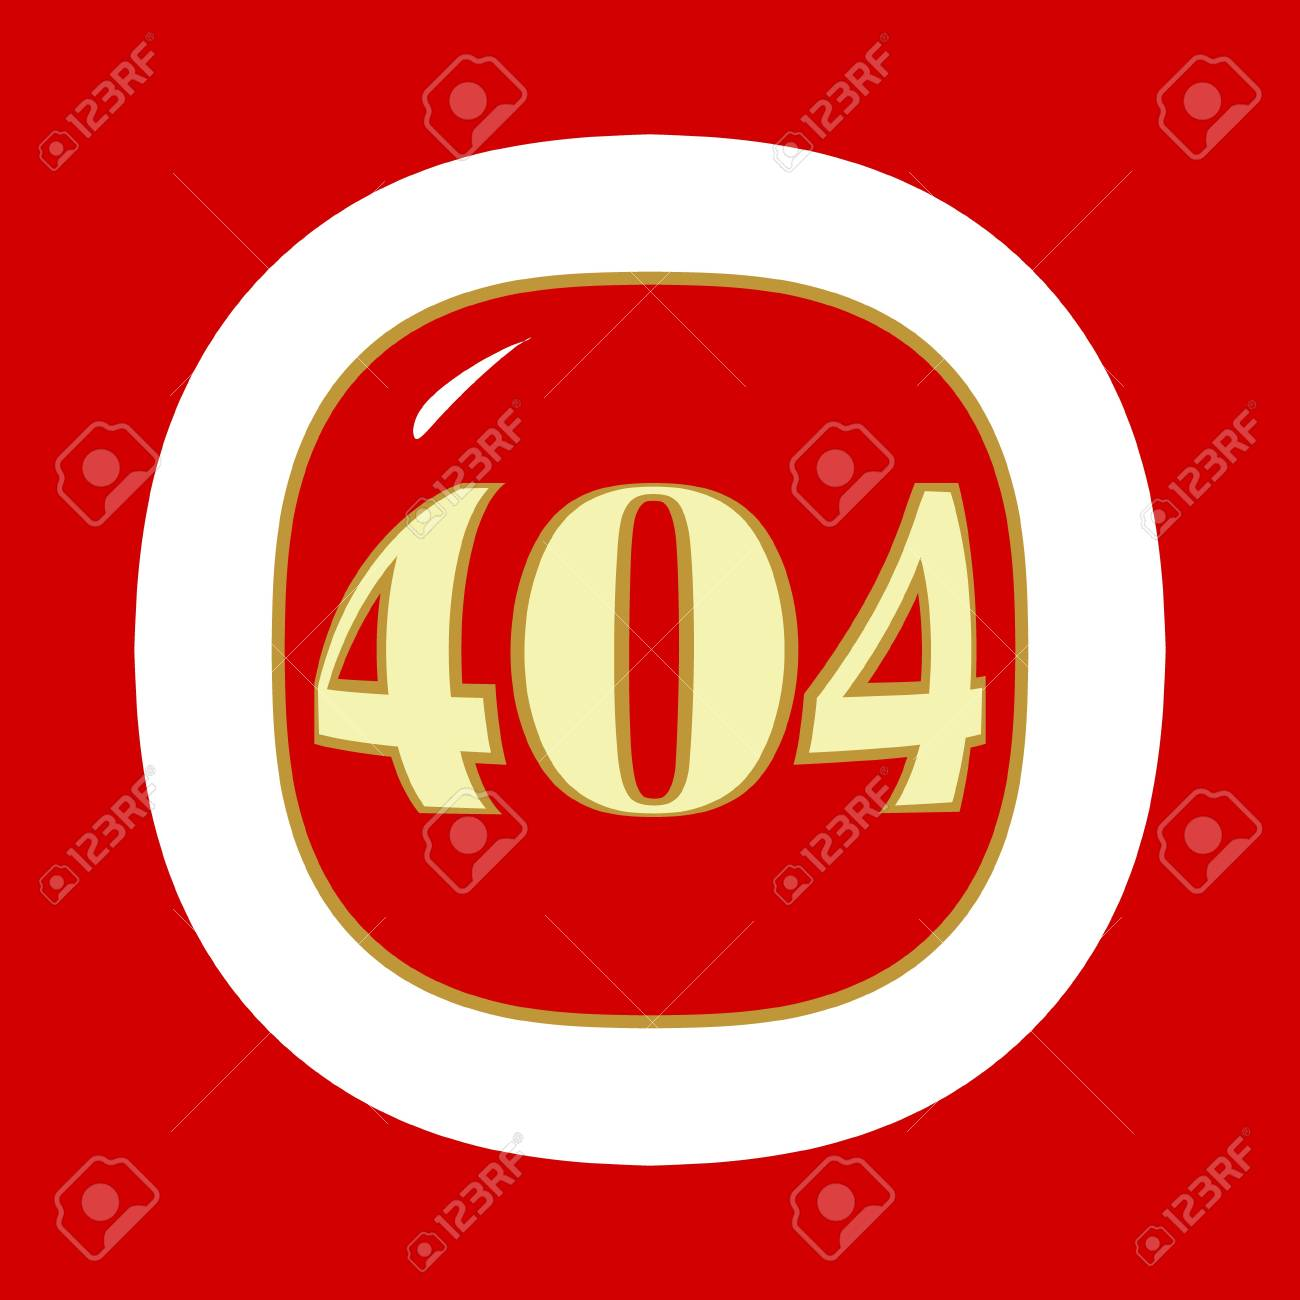 Red 404 error symbol in a unique style. Vector illustration Stock Vector - 19244675